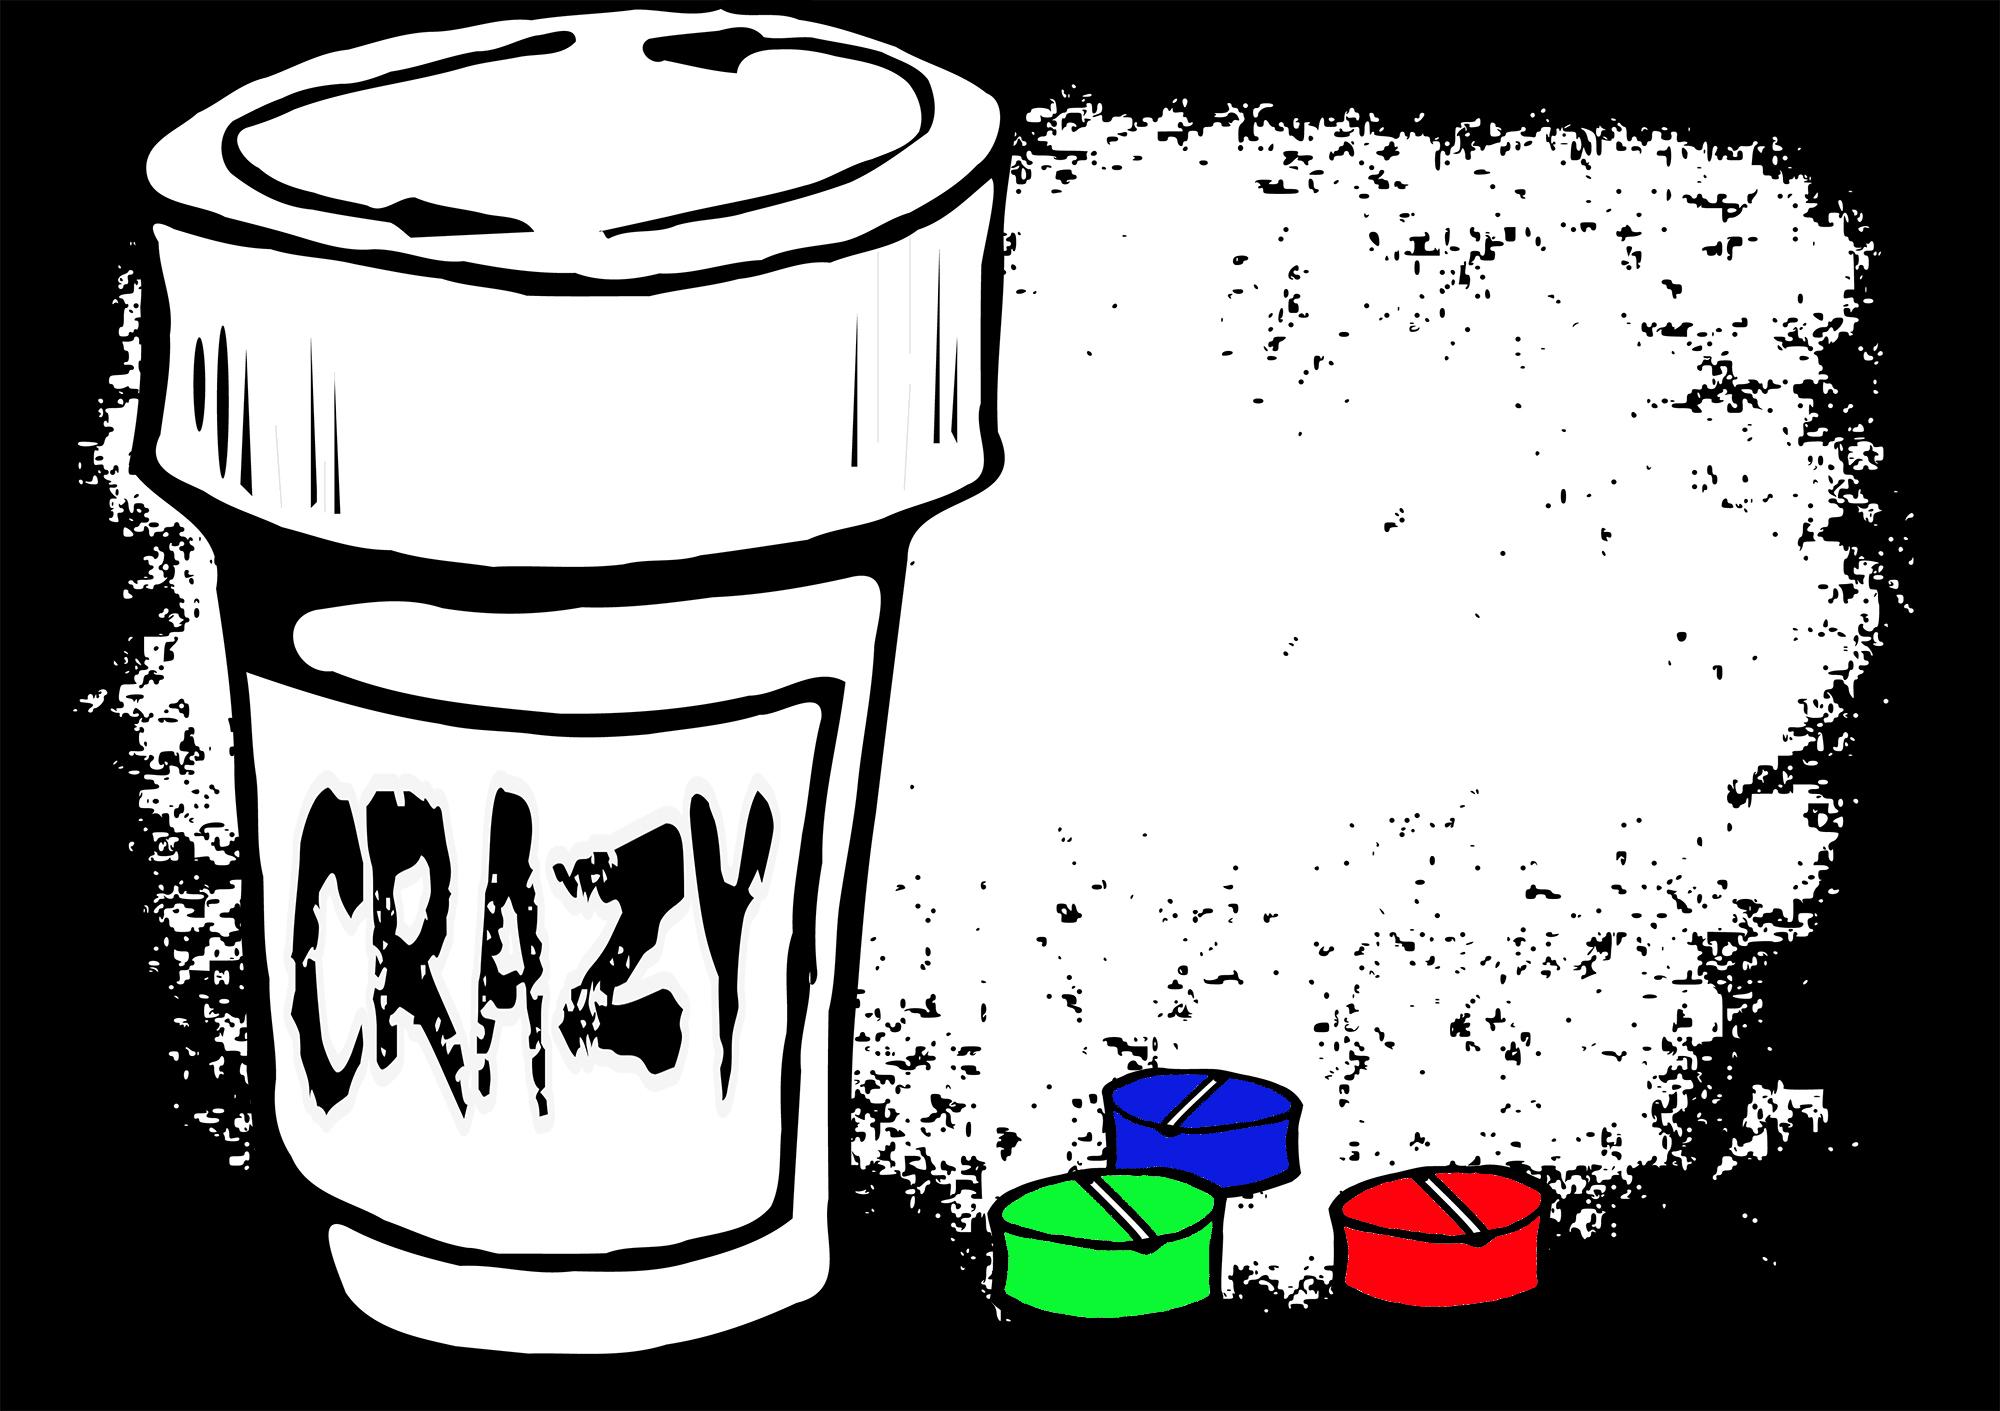 Psycho Secrets: Certified Crazy People